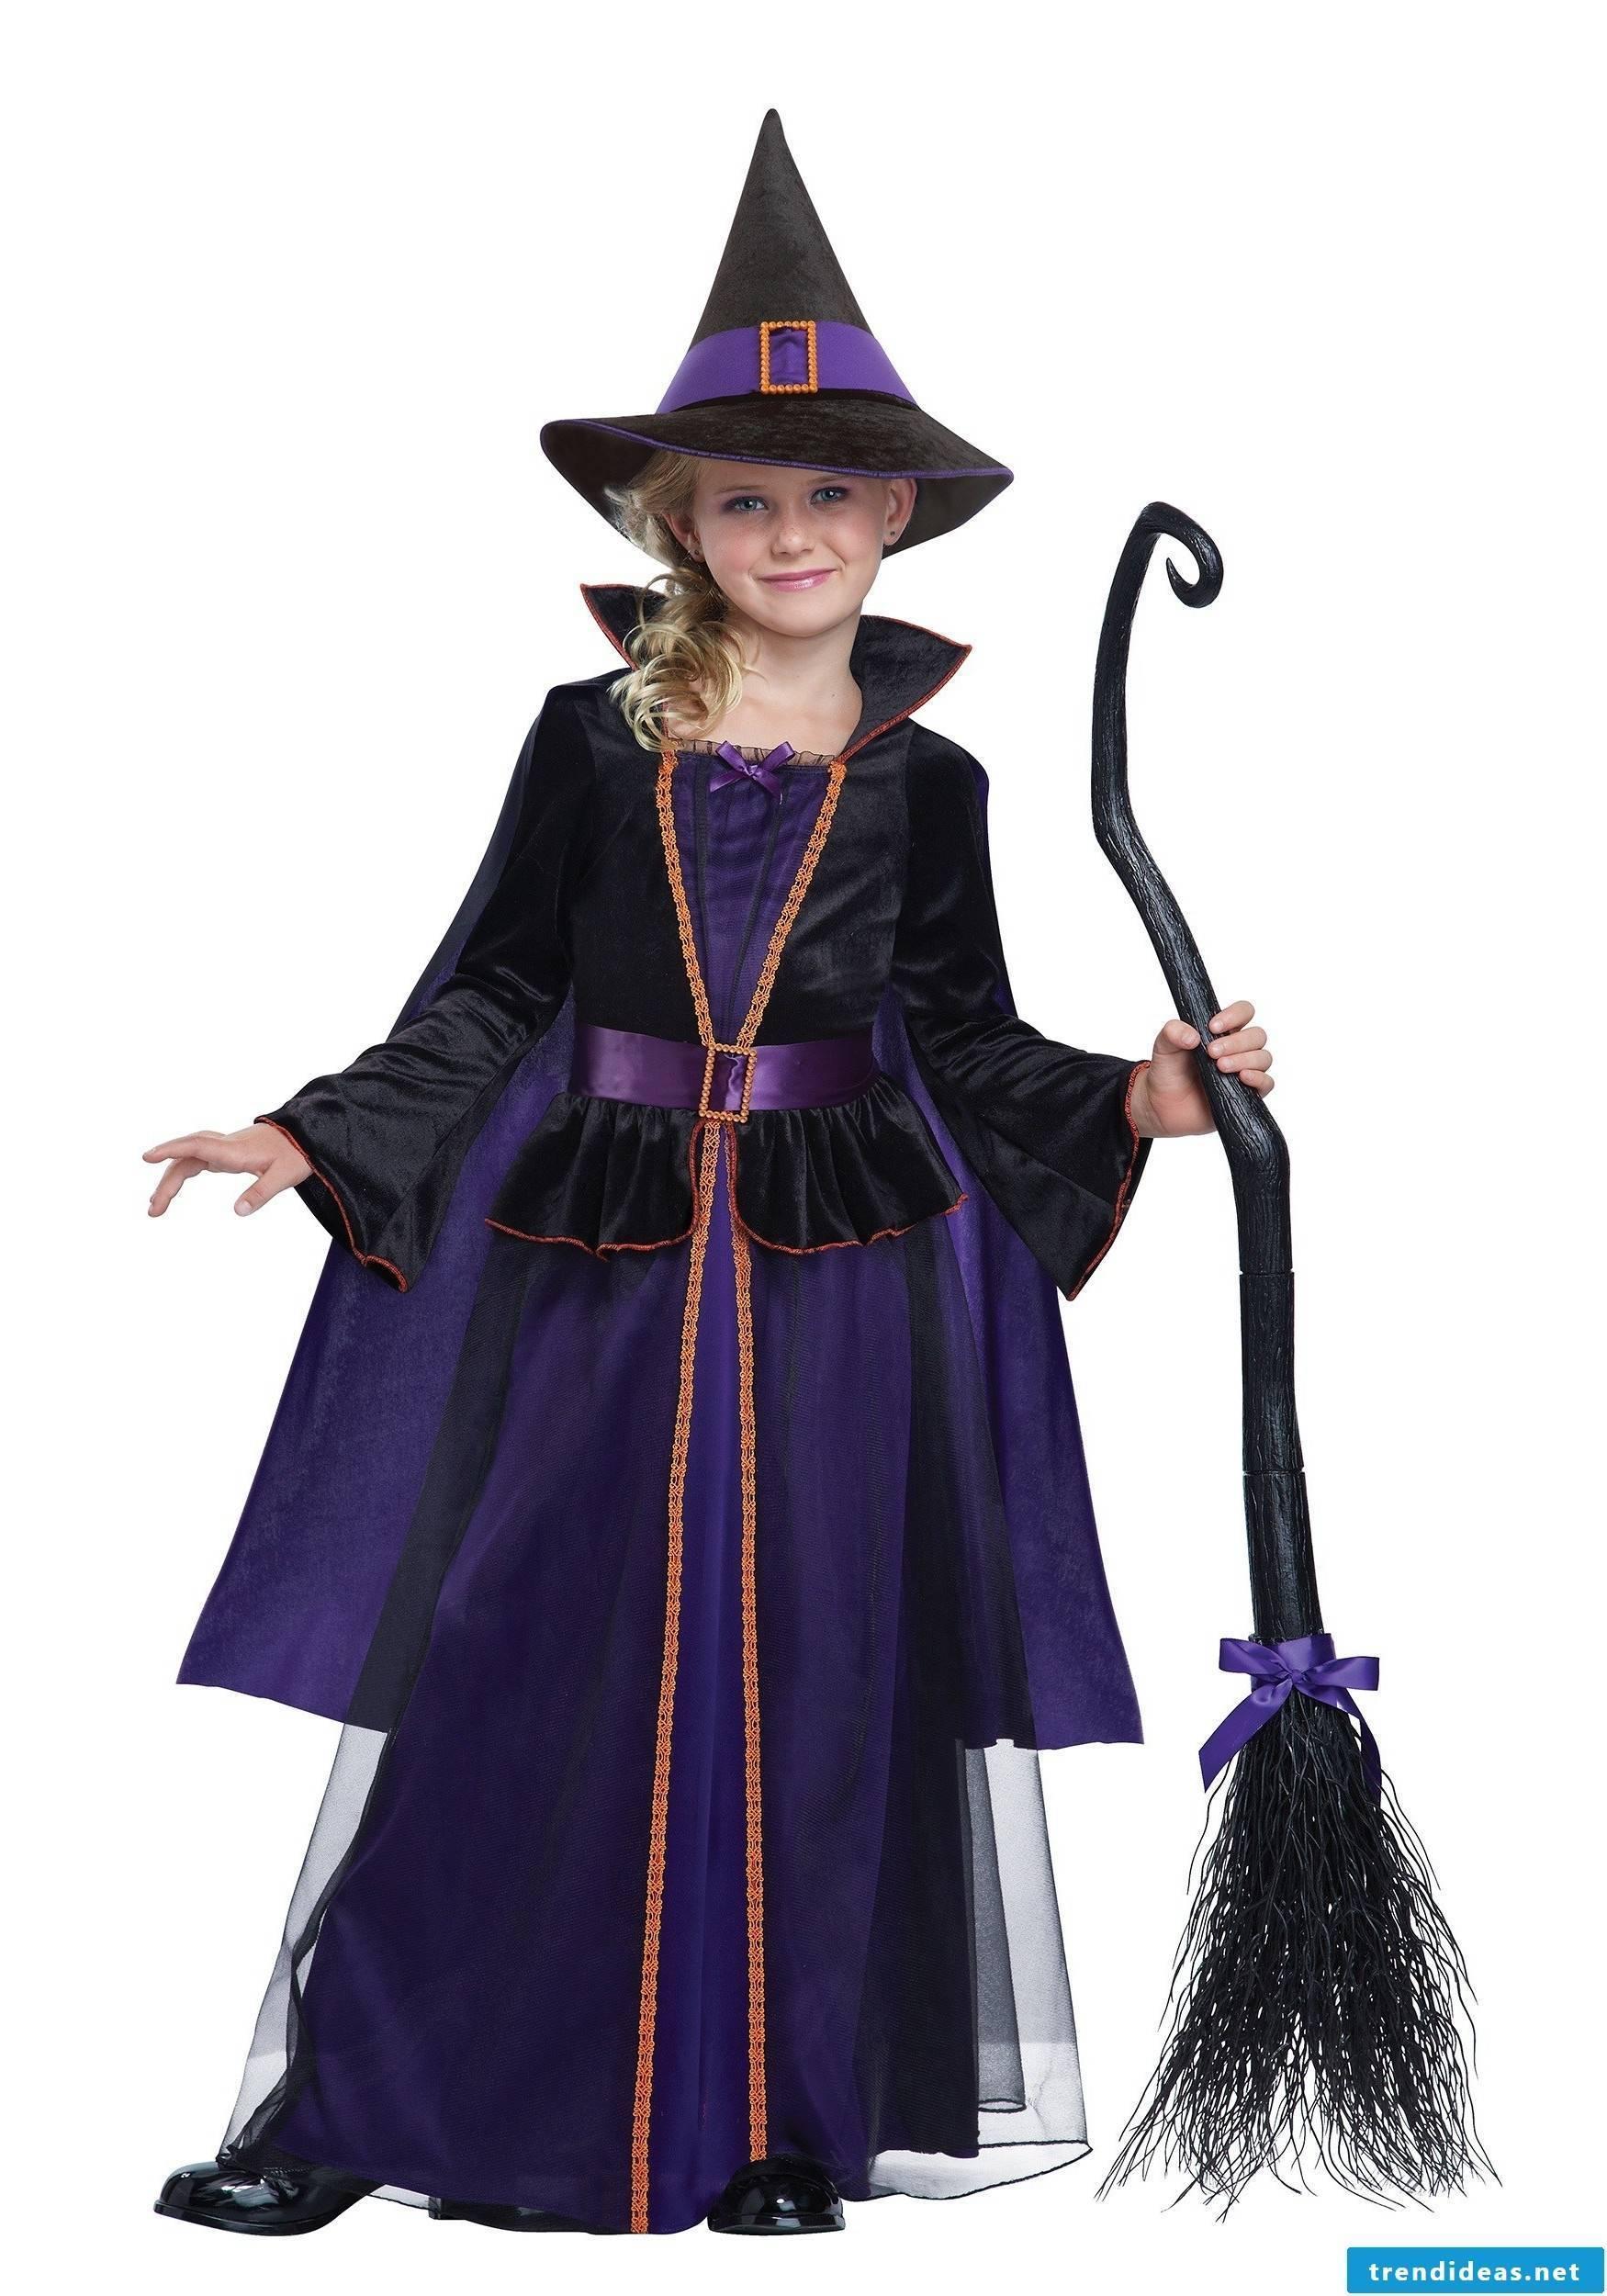 Witch costume for children - a true classic